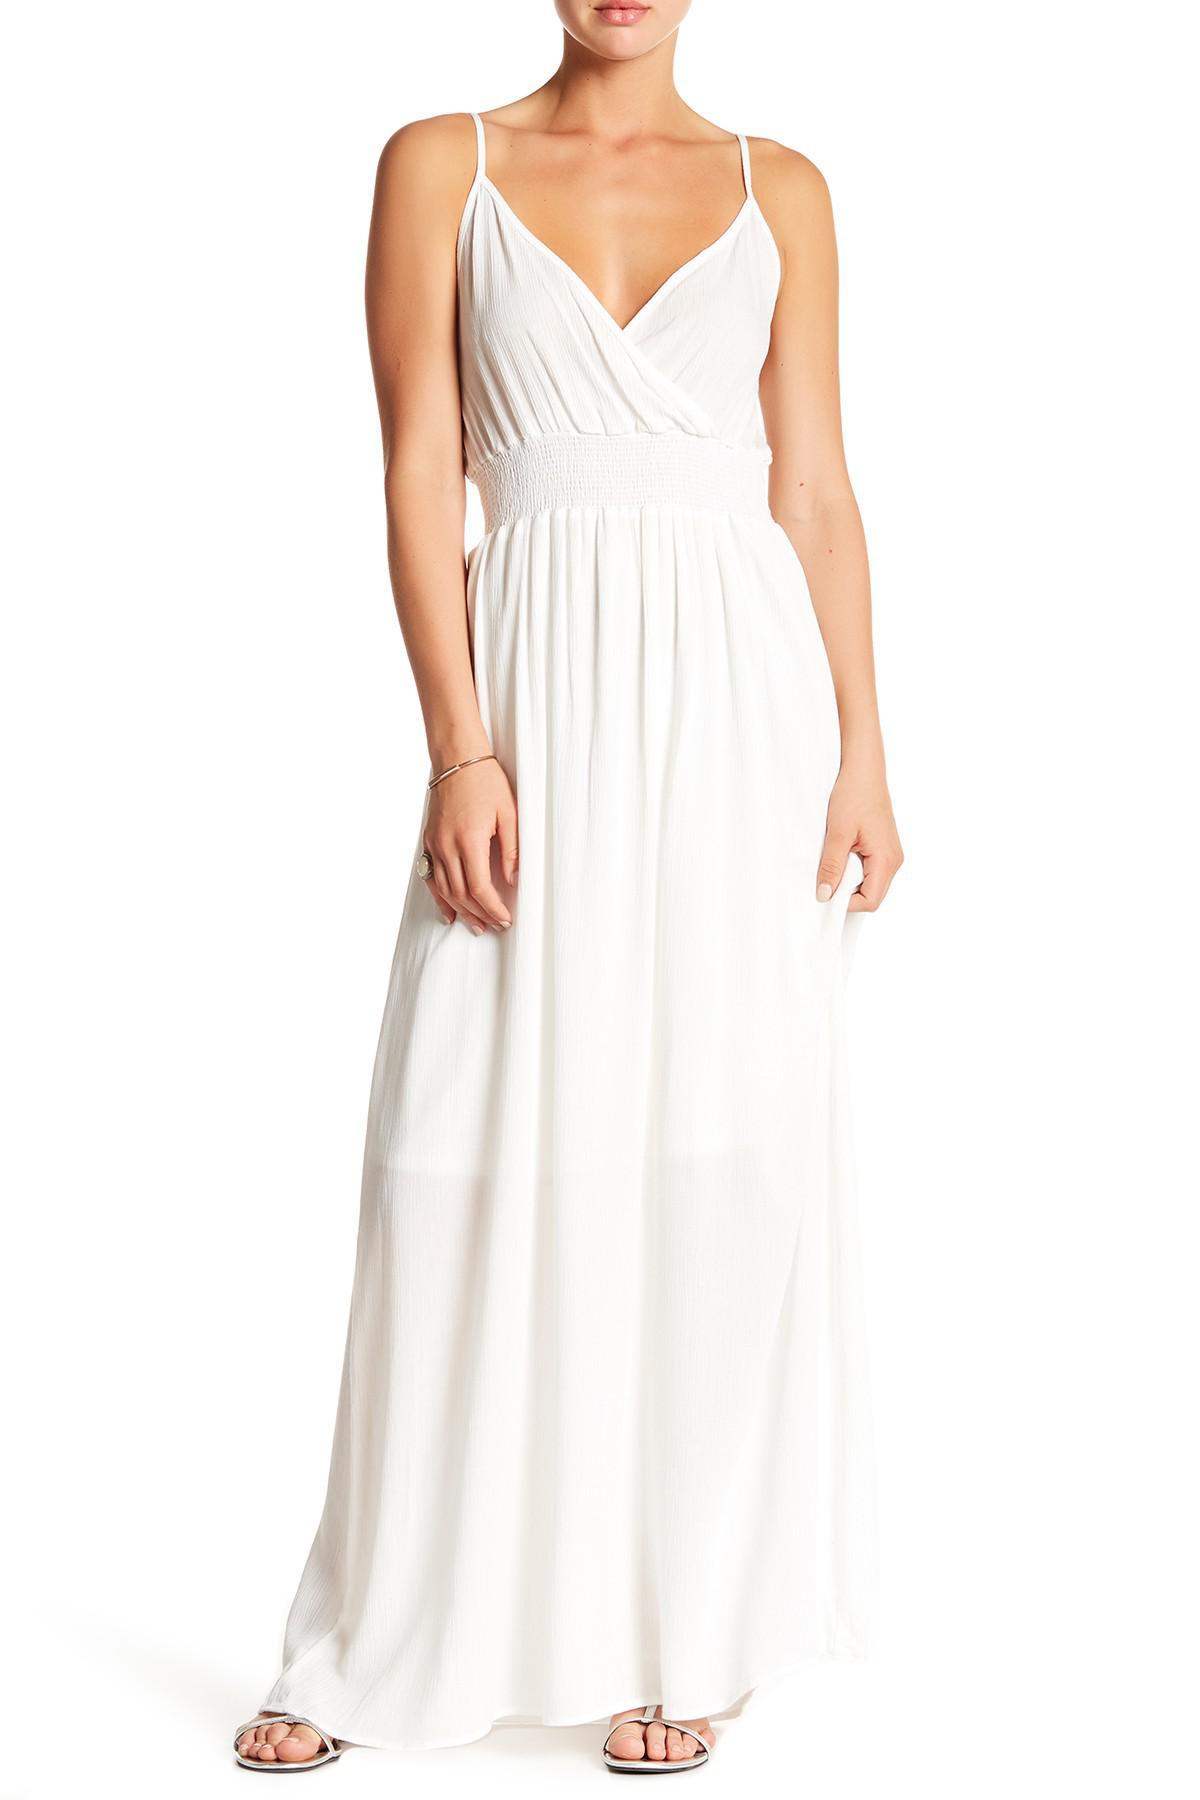 Lyst - West Kei Gauze Maxi Dress in White